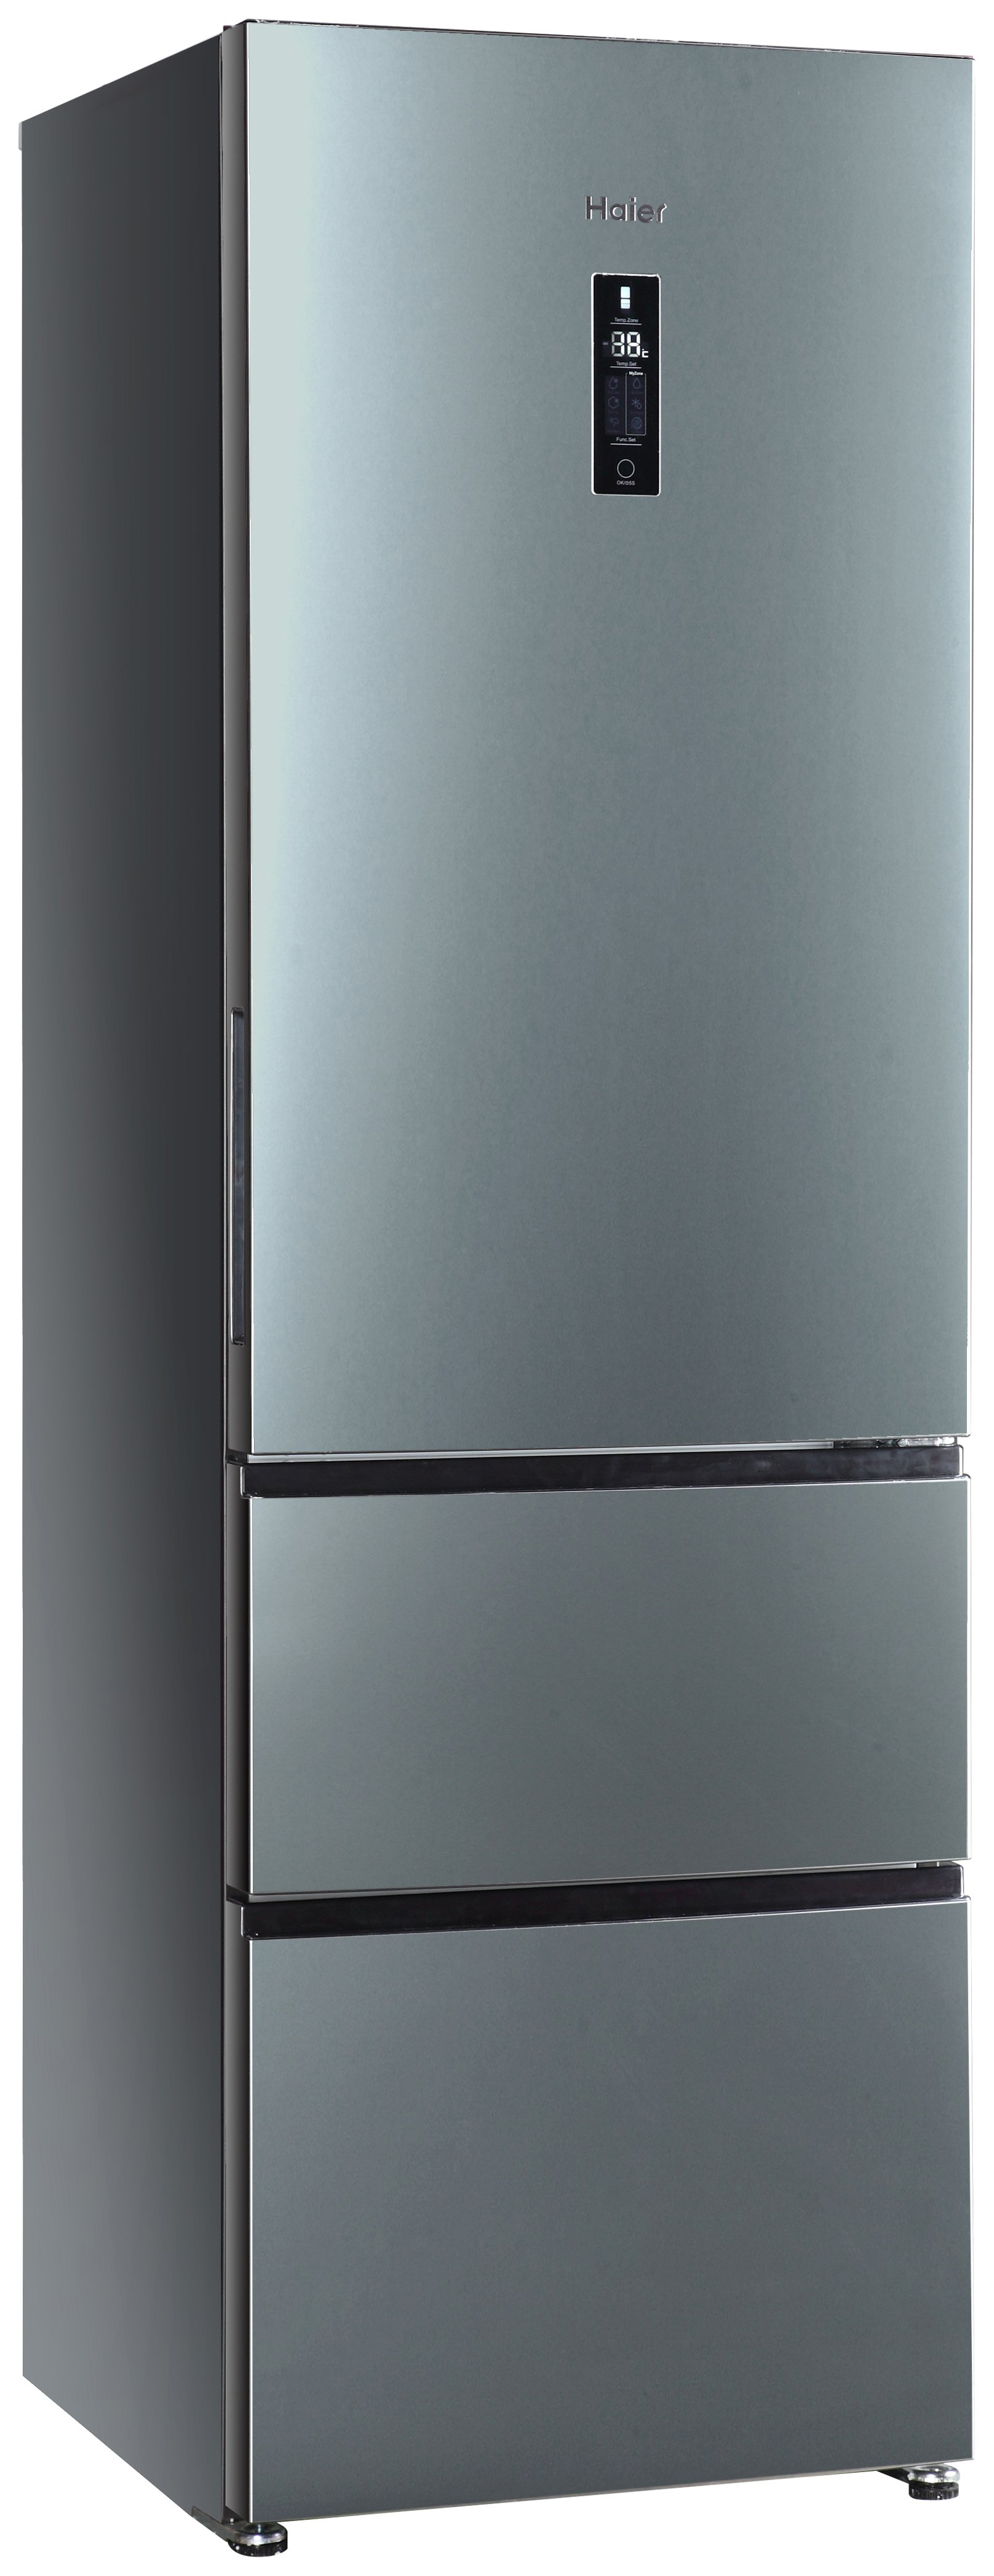 Image of Haier - A2FE635CFJ - Fridge Freezer - Stainless Steel